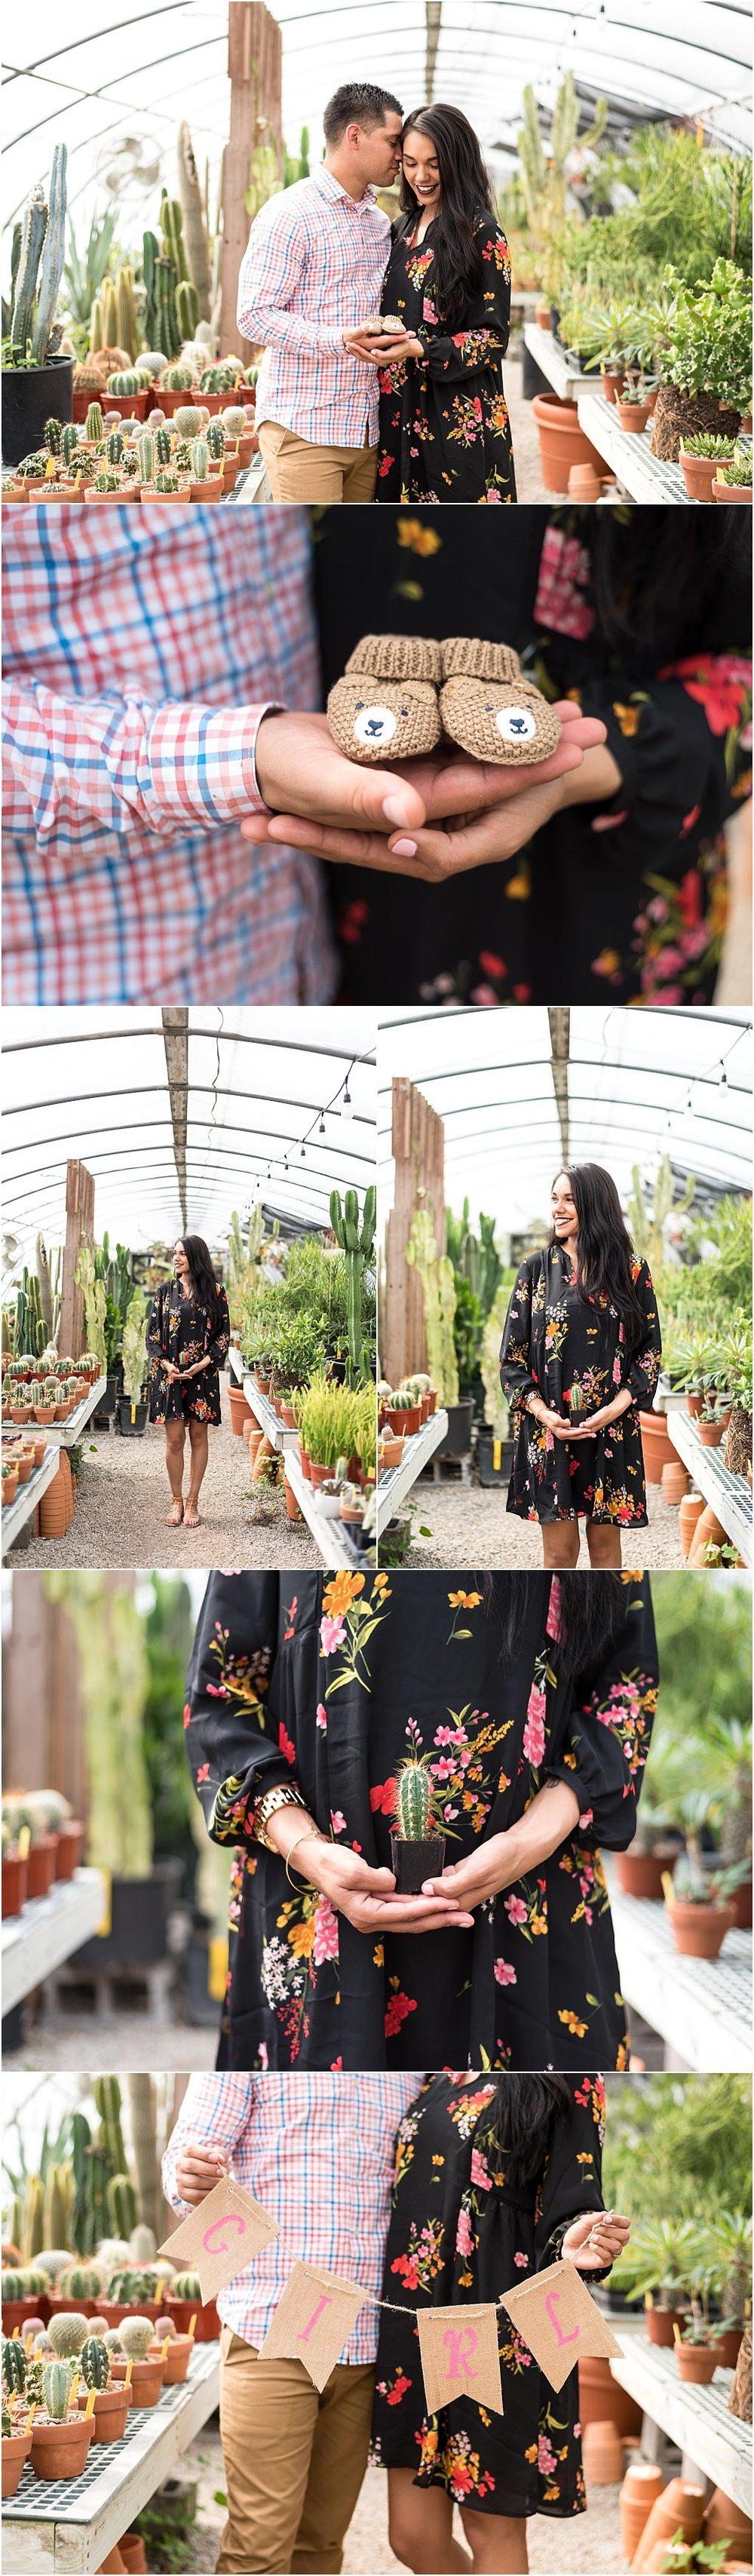 Hewitt-Garden-Center-Green-House-Phoography-Session-Pregnancy-Announcement-Nashville-Lifestyle-Photographer+1